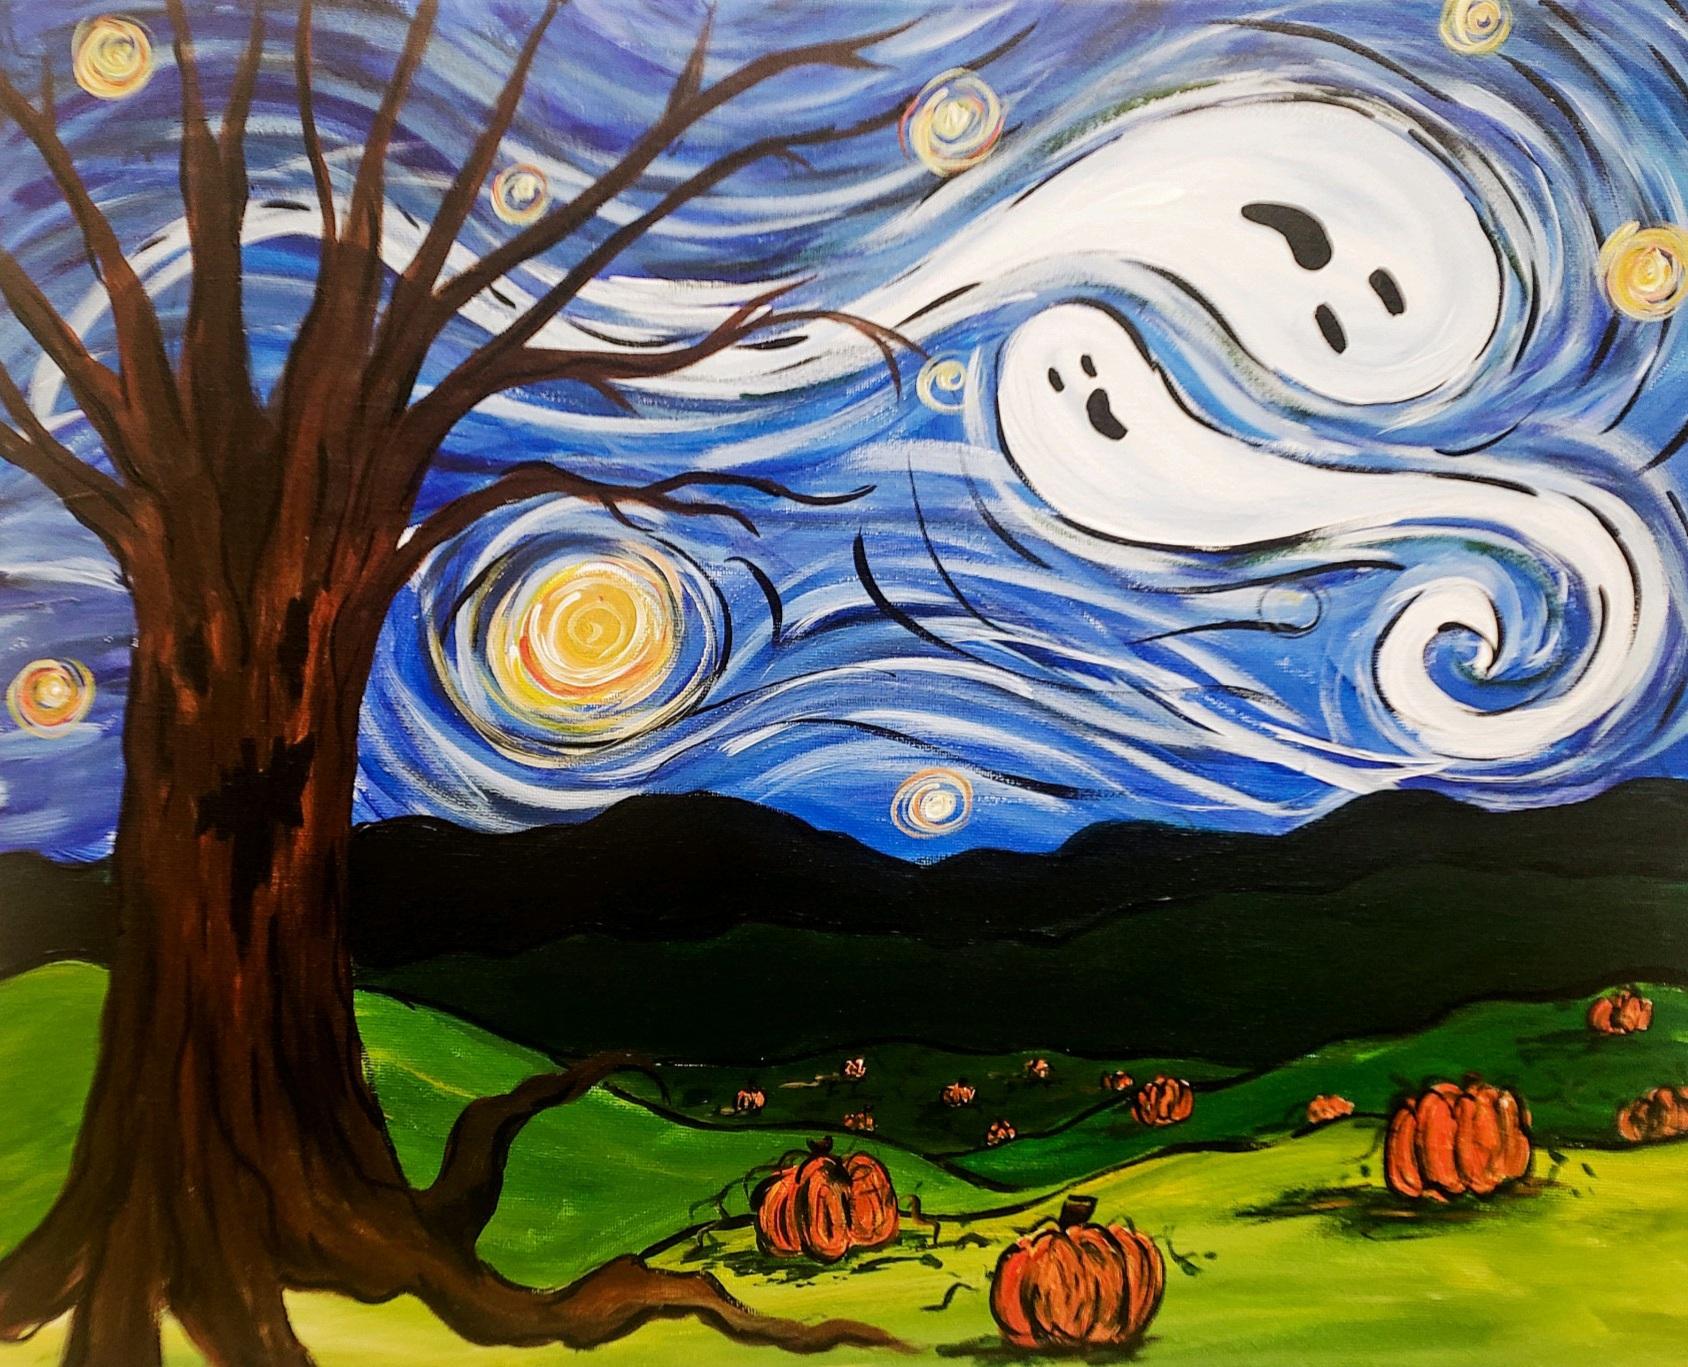 IN-STUDIO: Starry Halloween Night - 16x20 Acrylic on Canvas